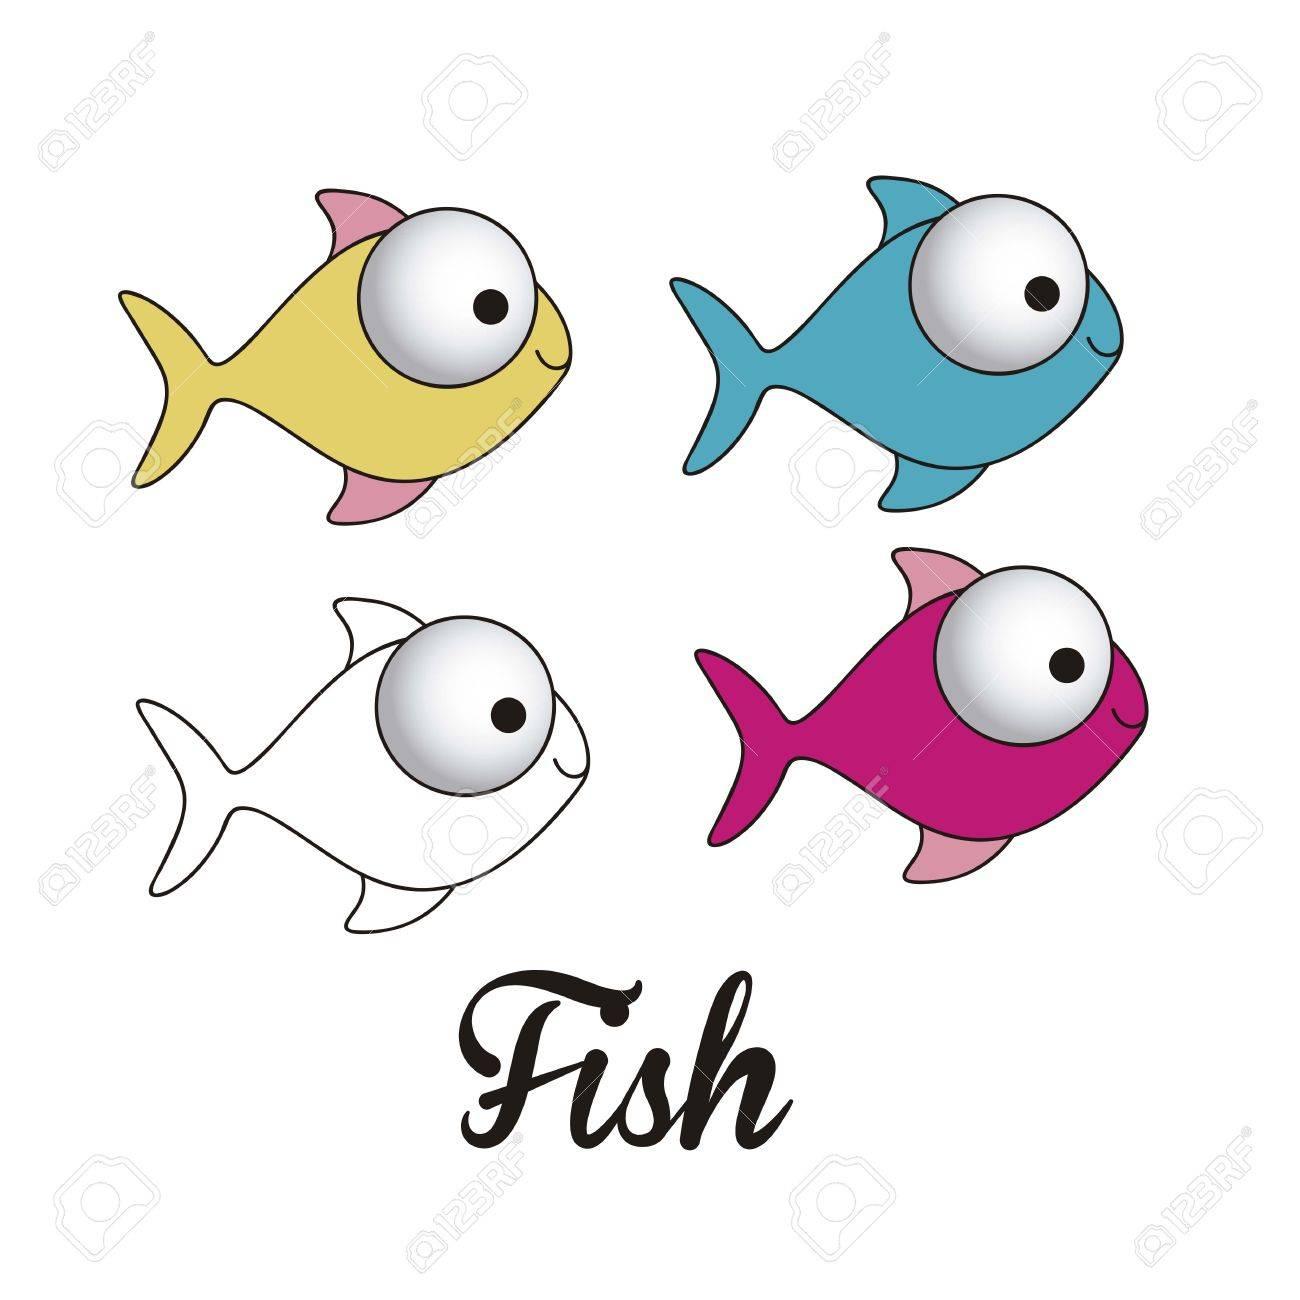 illustration of icons of fish, aquatic animals Stock Vector - 18759961